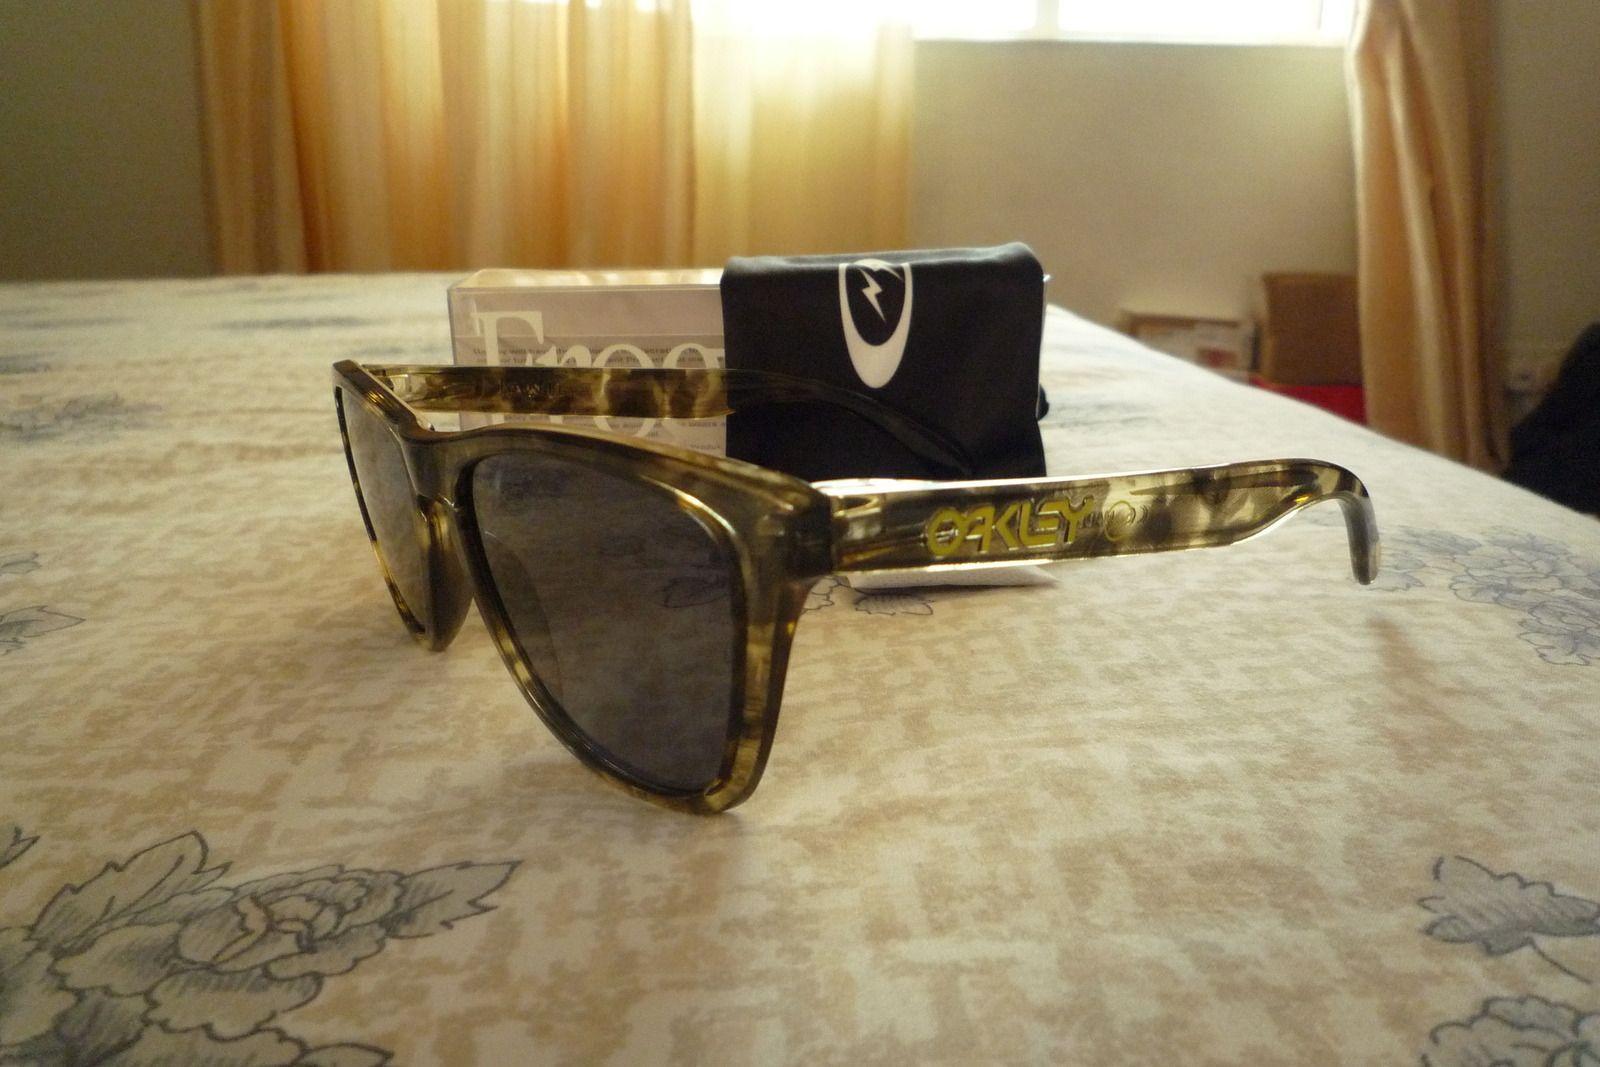 Fragment Design X Oakley Yellow/Brown Camo/Tortoise Frogskins - p1020421x.jpg